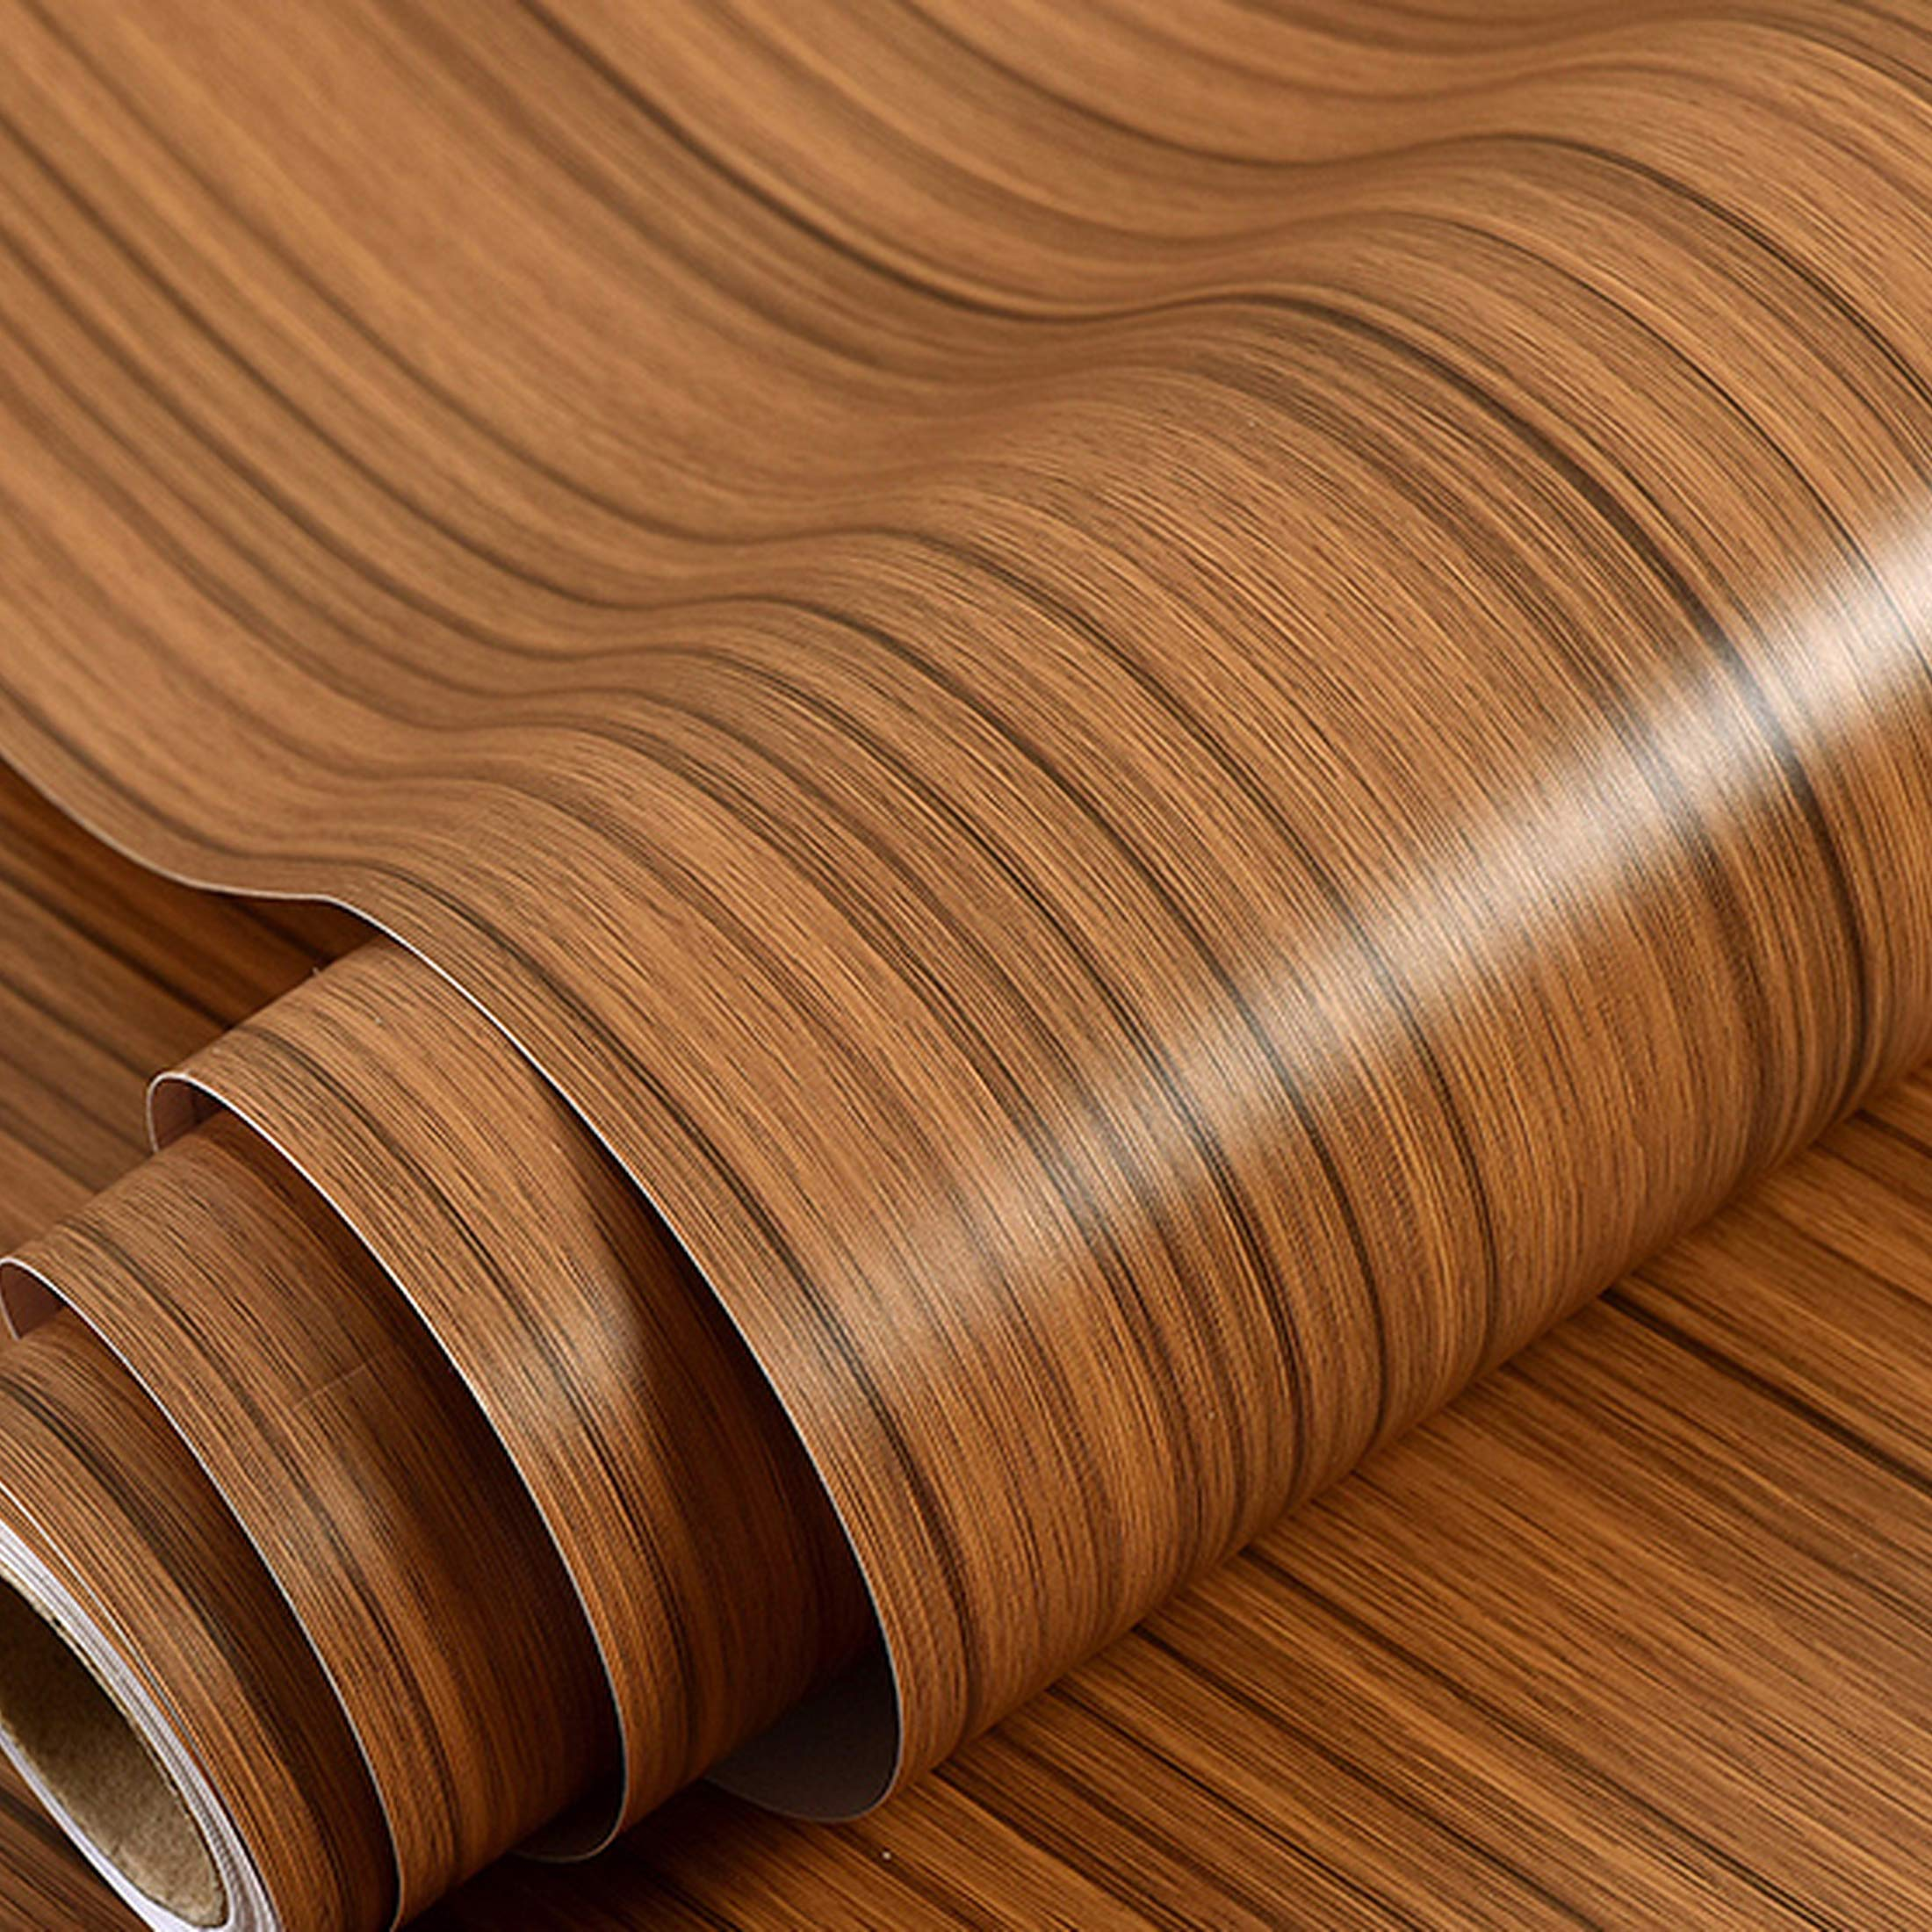 Wolpin Wall Stickers Furniture Wallpaper Wood (60 x 300 cm) Door, DIY Vinyl, Almirah, Shelf Liner, Revamp Desk Table Top, Wardrobe, Kitchen Cupboard Decoration Self Adhesive, Brown